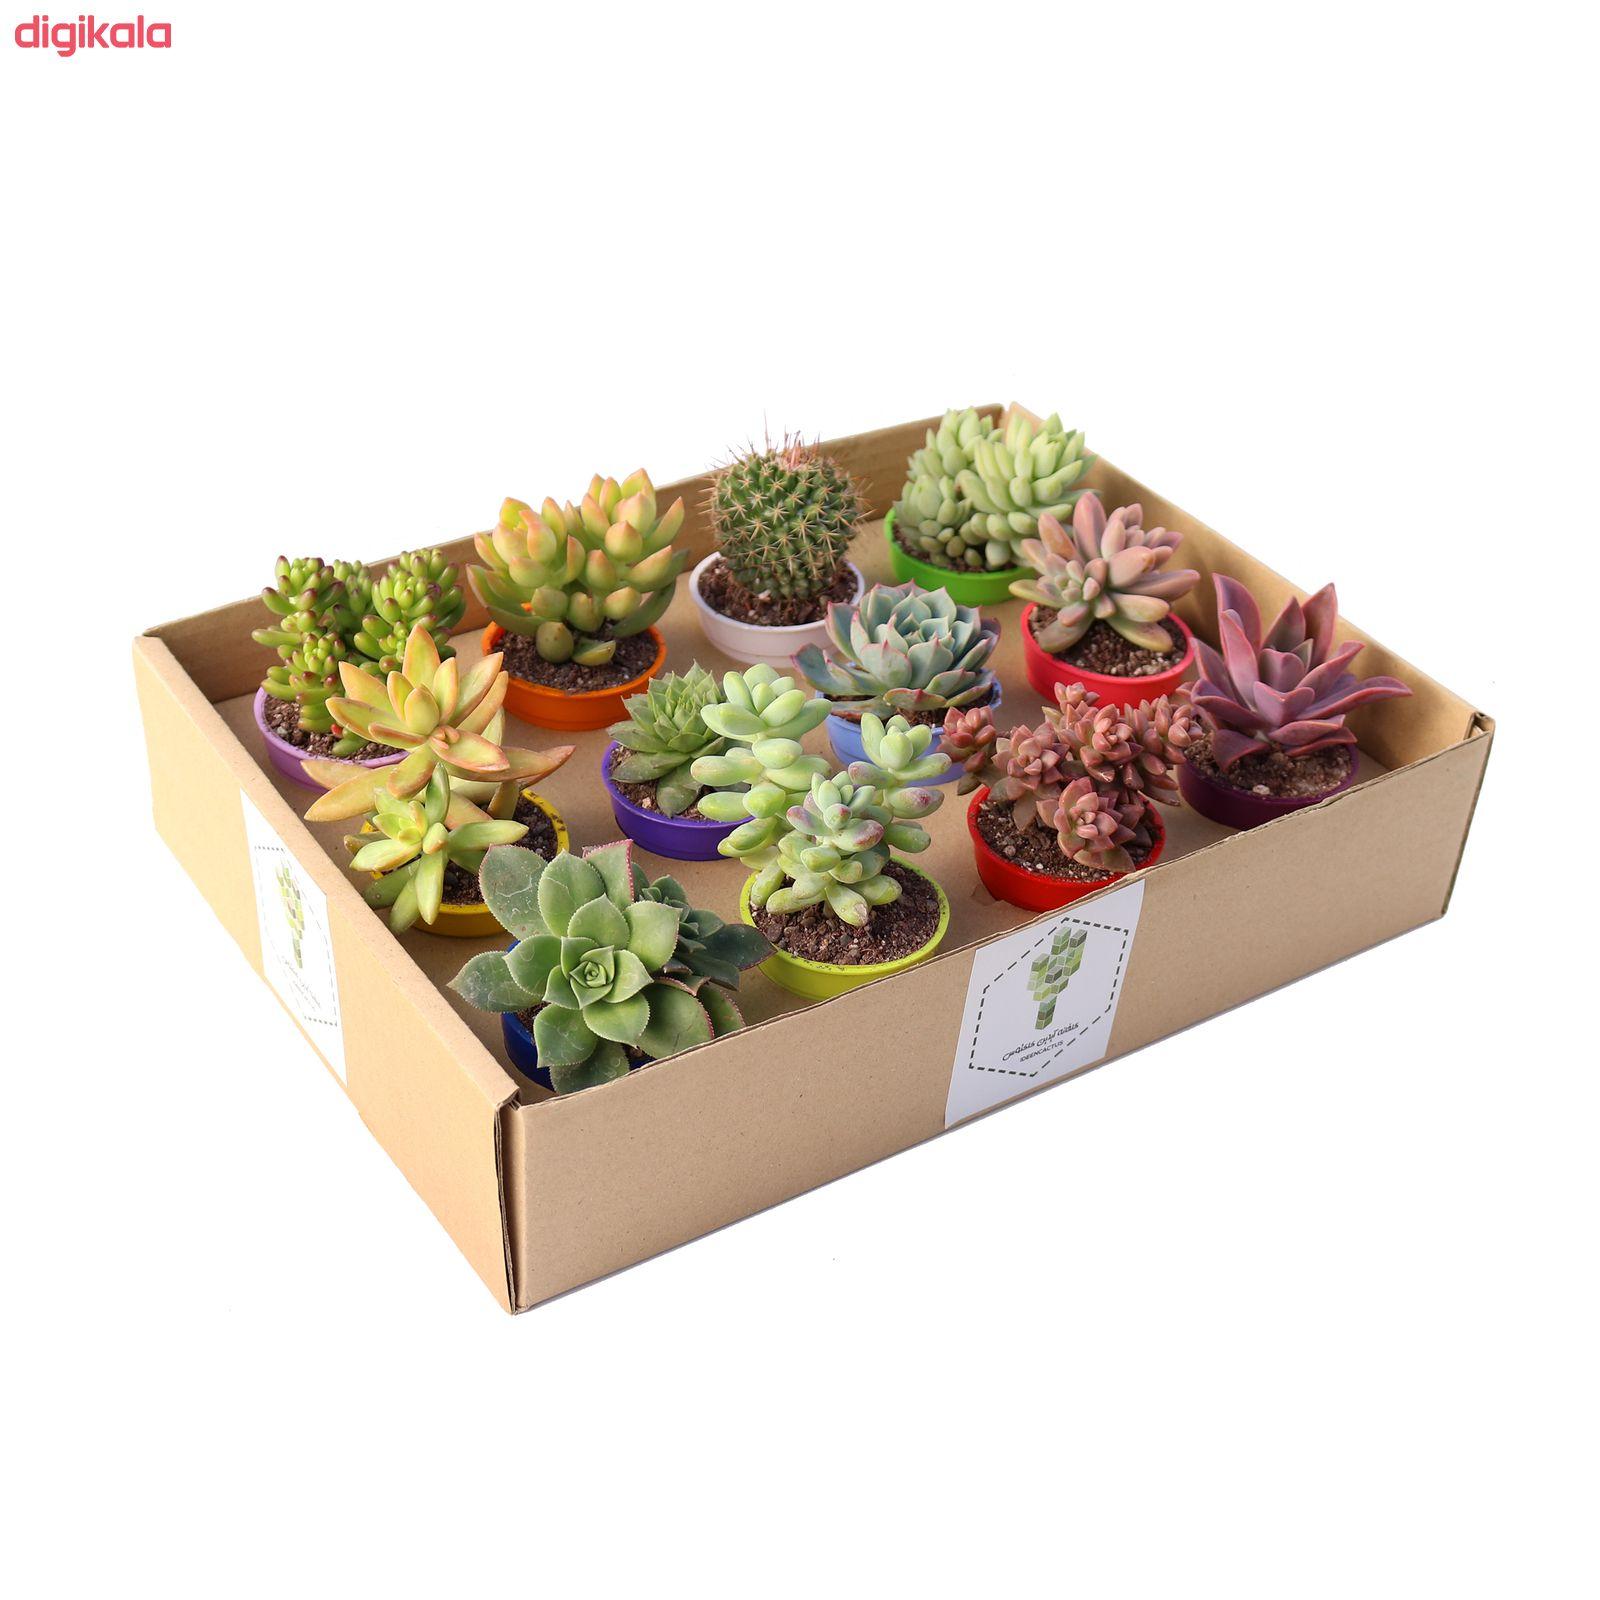 گیاه طبیعی کاکتوس و ساکولنت آیدین کاکتوس کد CB-009 بسته 12 عددی main 1 4